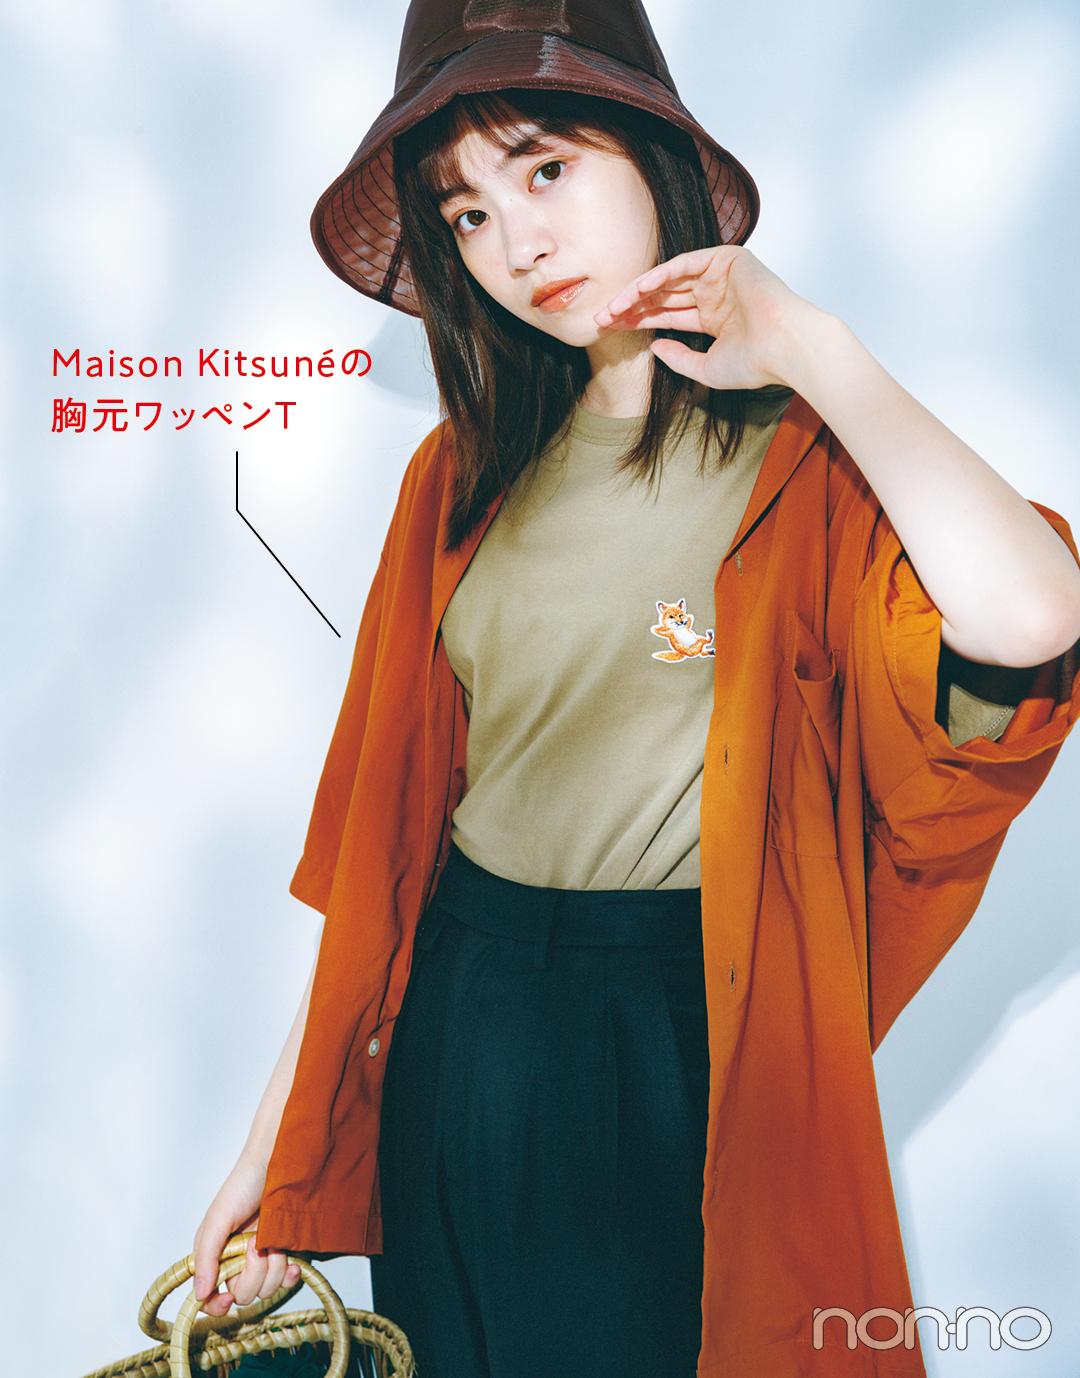 Maison Kitsunéの胸元ワッペンT